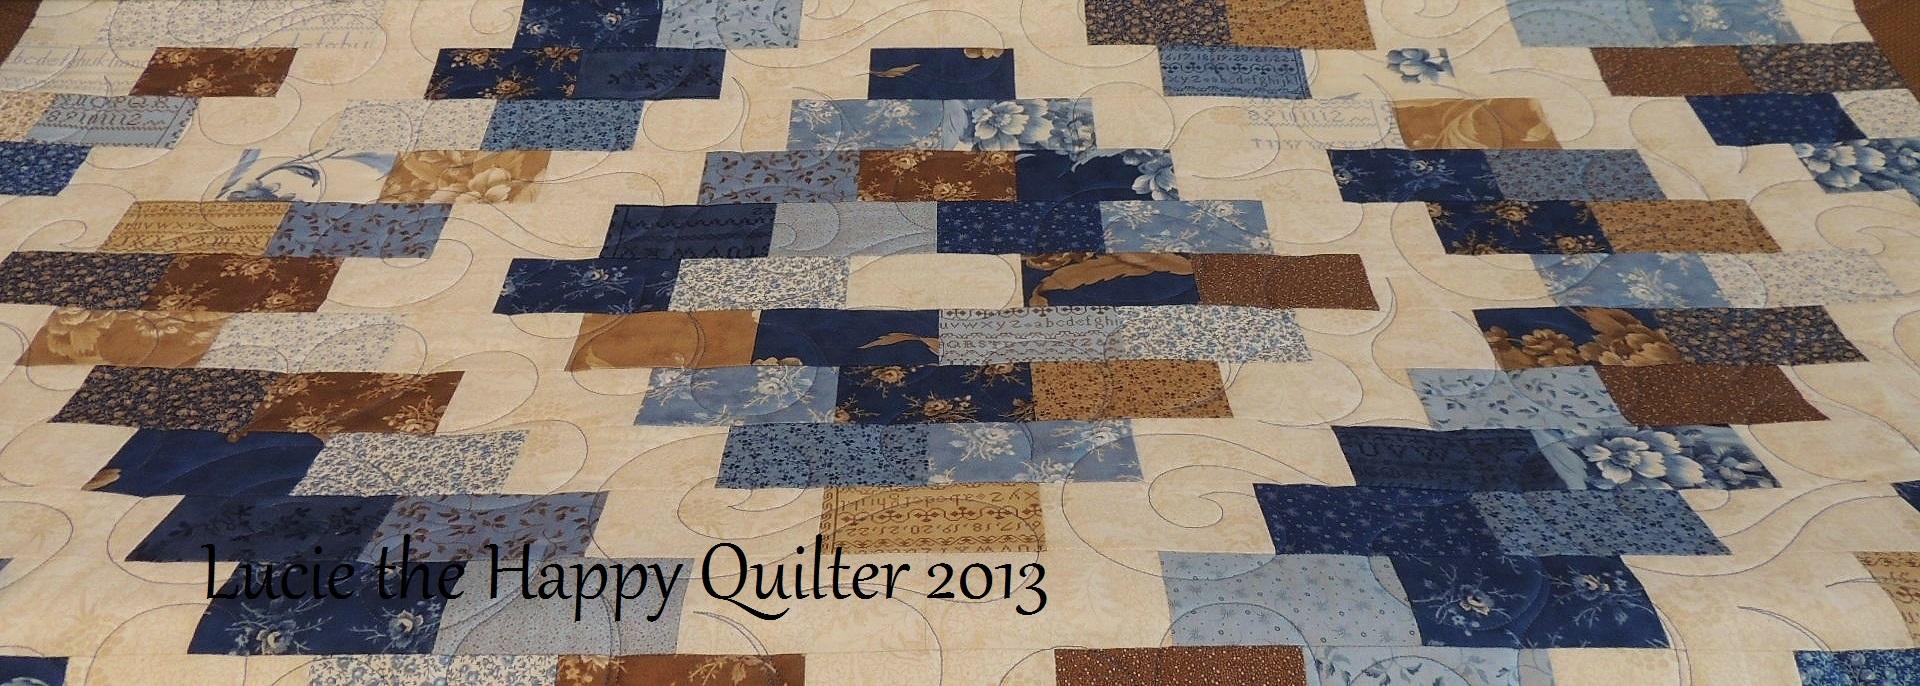 Blueberry Brick Quilt | Lucie The Happy Quilter's Blog : brick quilt - Adamdwight.com